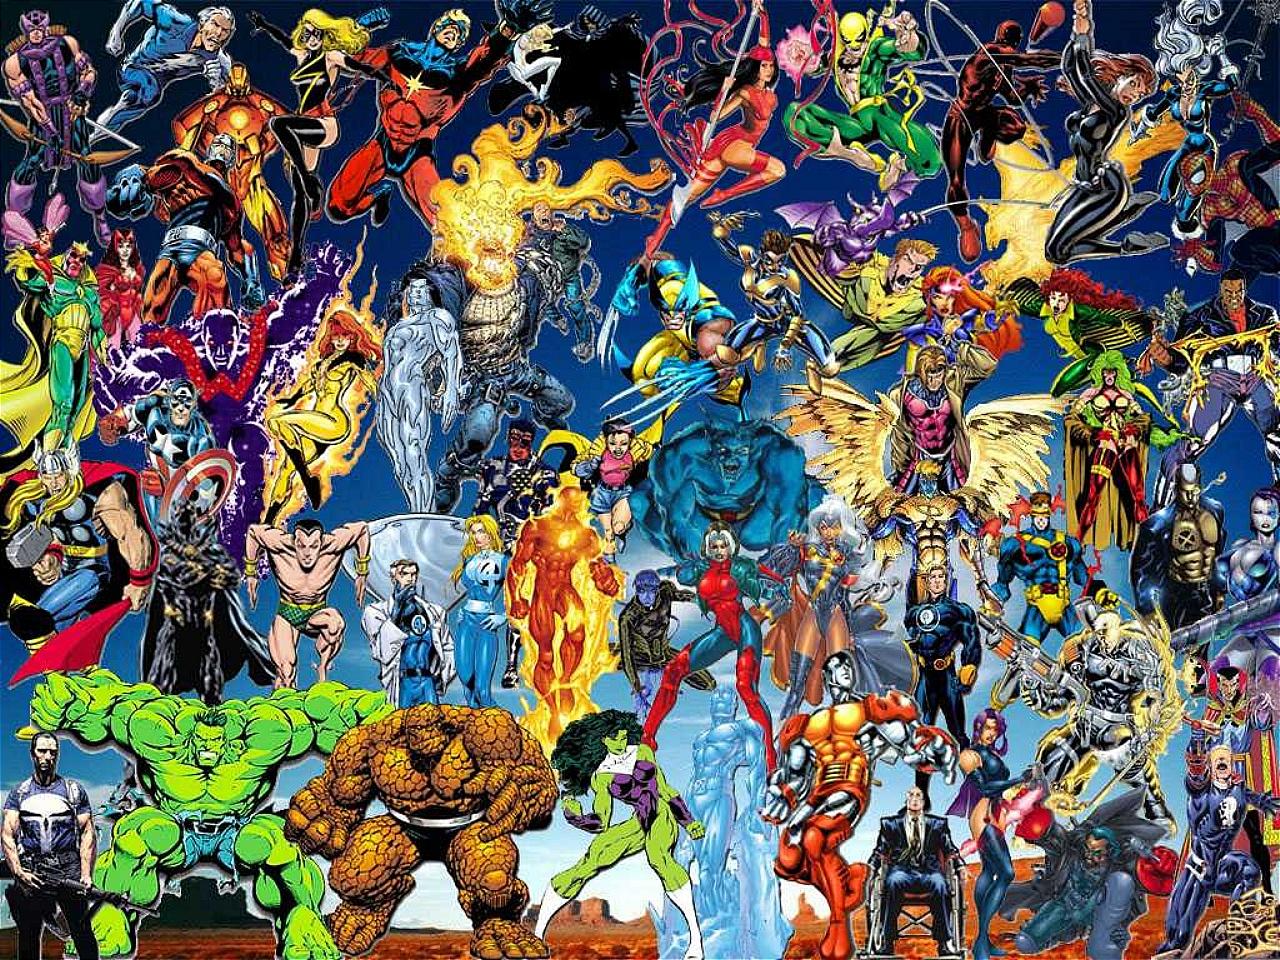 Marvel Comics Wallpapers, 4K Ultra HD Marvel Comics Backgrounds #652JJ